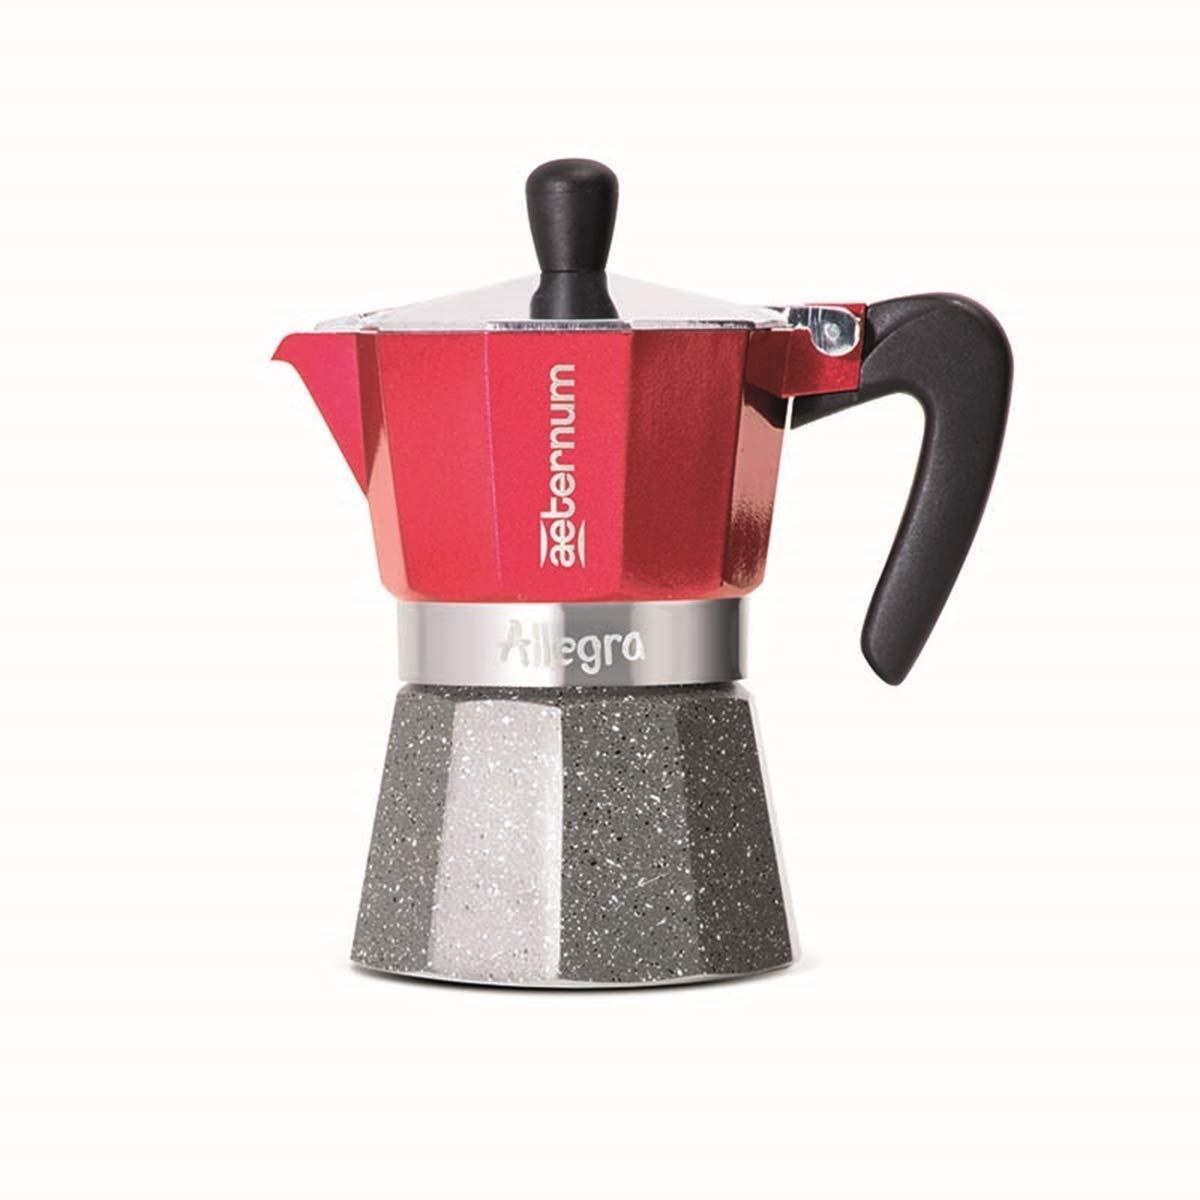 Bialetti Aeternum - Cafetera Italiana para 3 Tazas: Amazon.es: Hogar